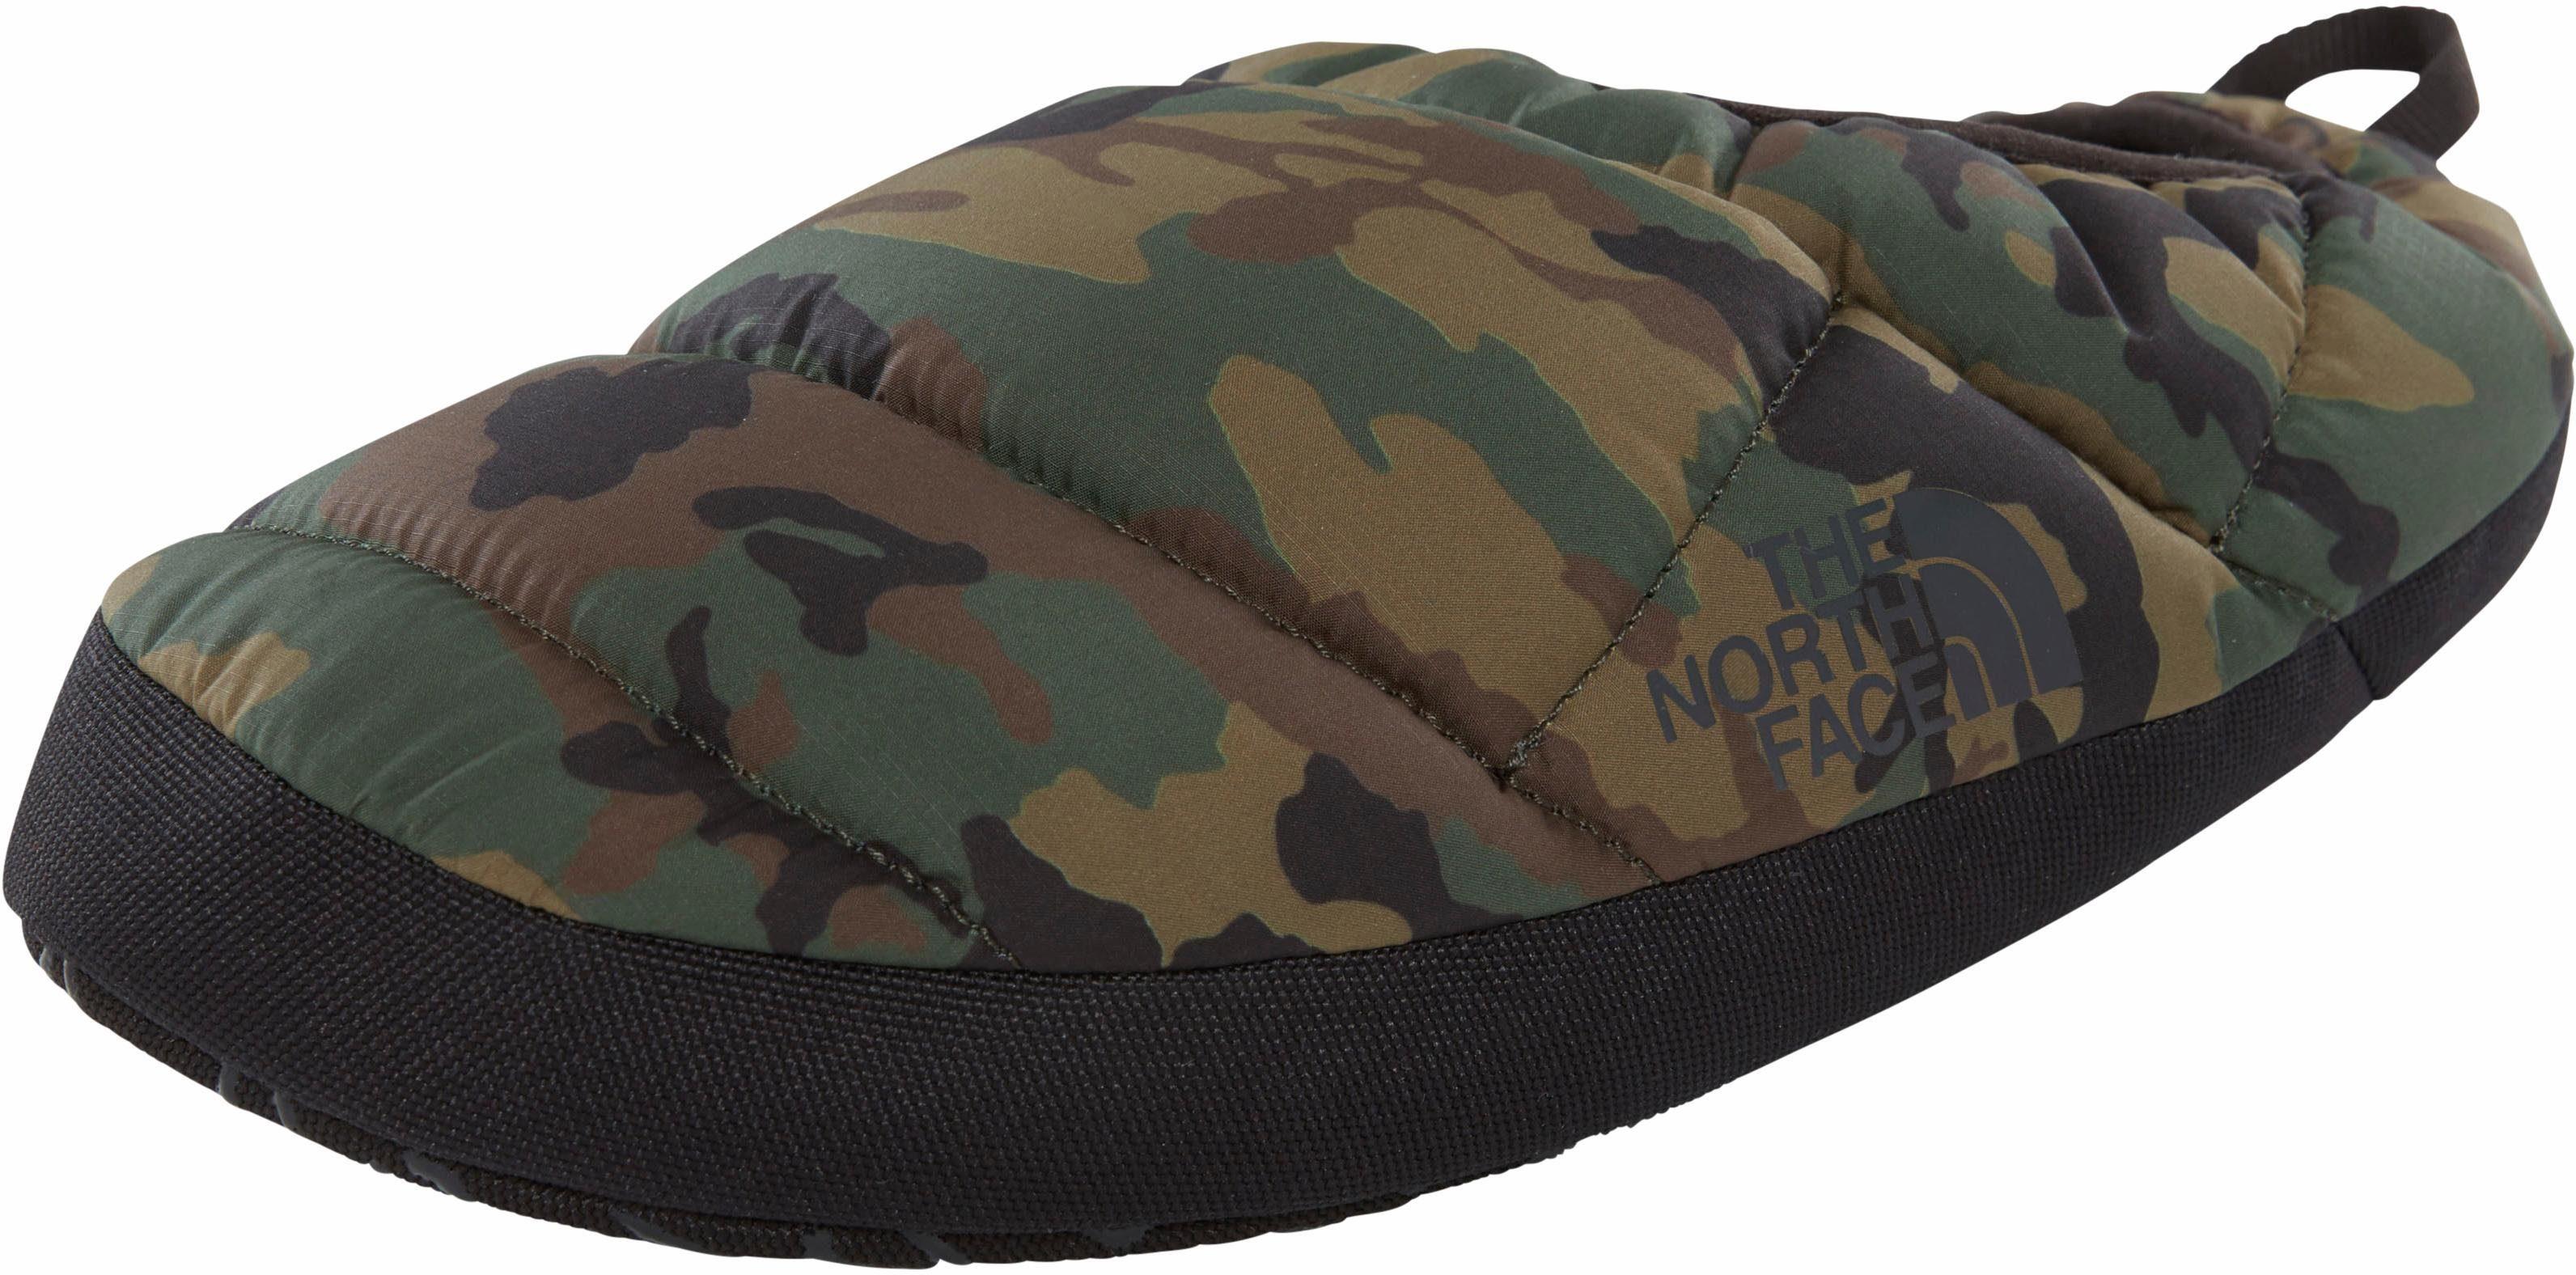 The North Face Men's NSE Tent Mule kaufen III Hüttenschuhe, gemustert online kaufen Mule  tarnfarben a71258